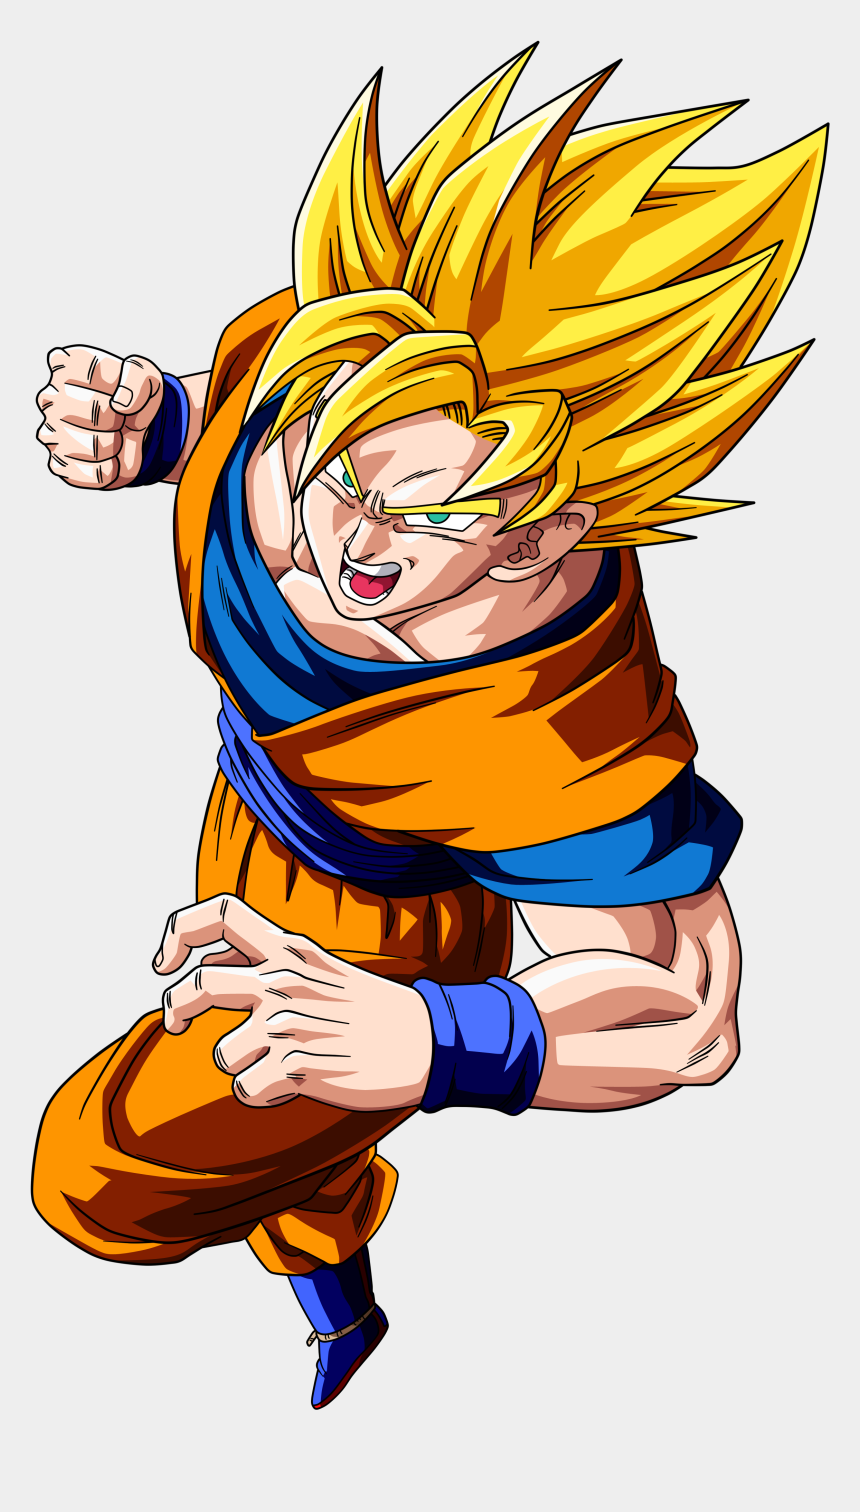 dragon ball z clipart, Cartoons - Dragon Ball Goku Png Clipart - Dragon Ball Goku Png